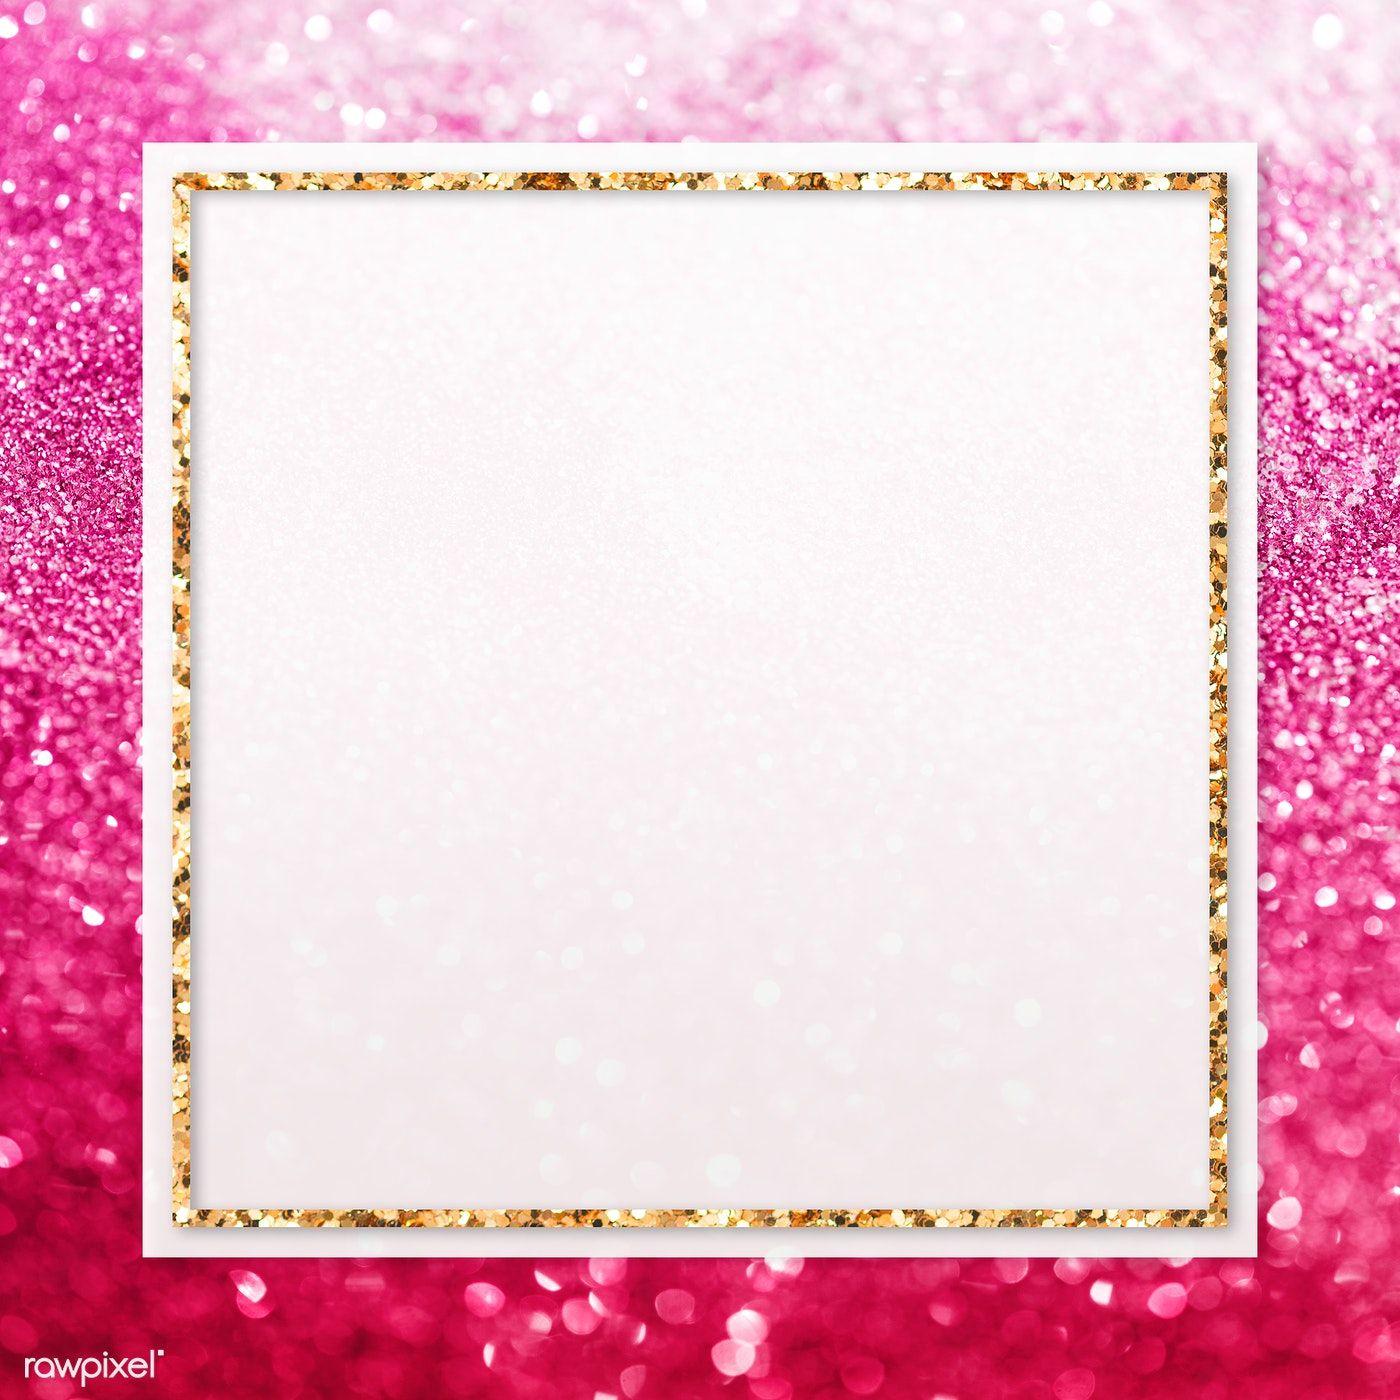 Golden Frame On Pink Sequin Transparent Png Premium Image By Rawpixel Com Manotang Pink Sparkle Background Pink Sequin Pink Sparkles